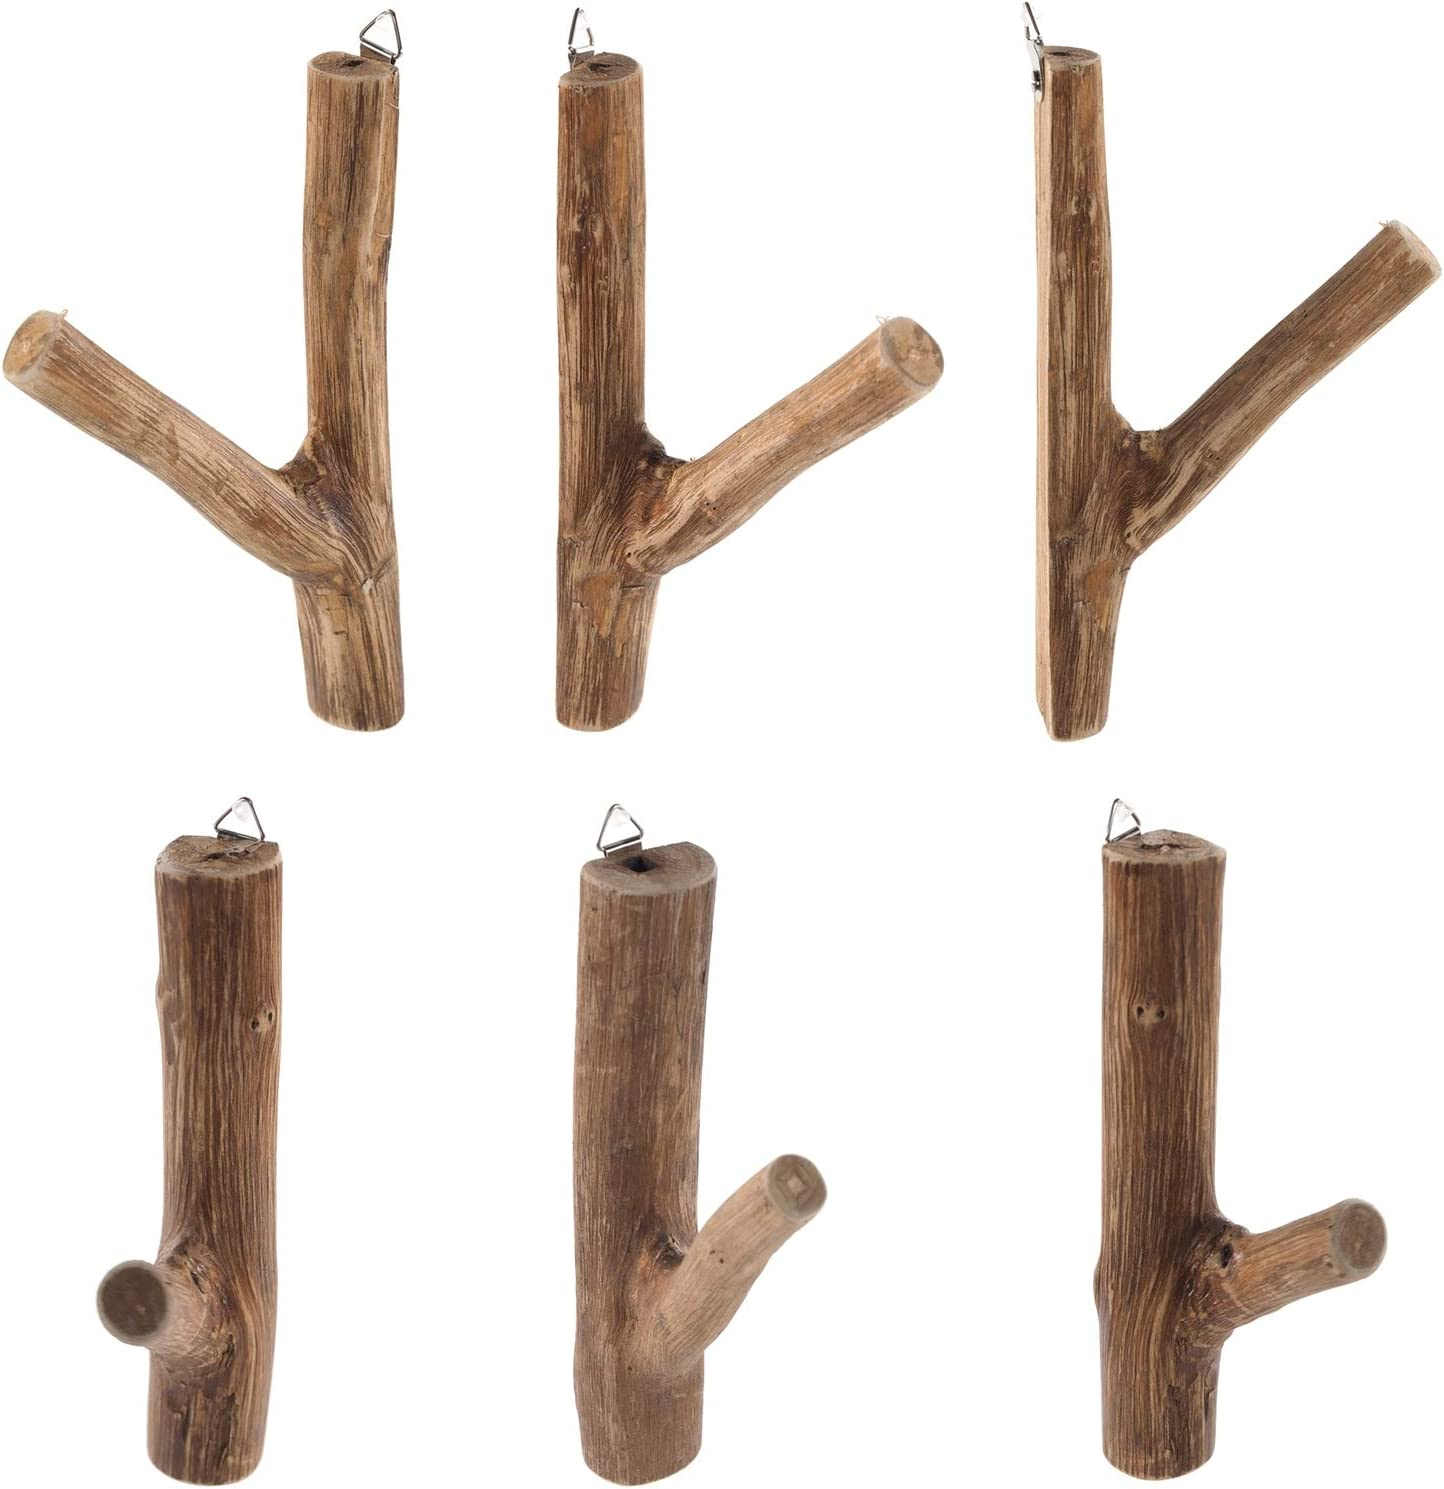 DESIGN DELIGHTS 6ER Set GARDEROBENHAKEN Limb 17x10x2,5 cm HxTxB ca Teakholz Wurzel | Shabby Kleiderhaken